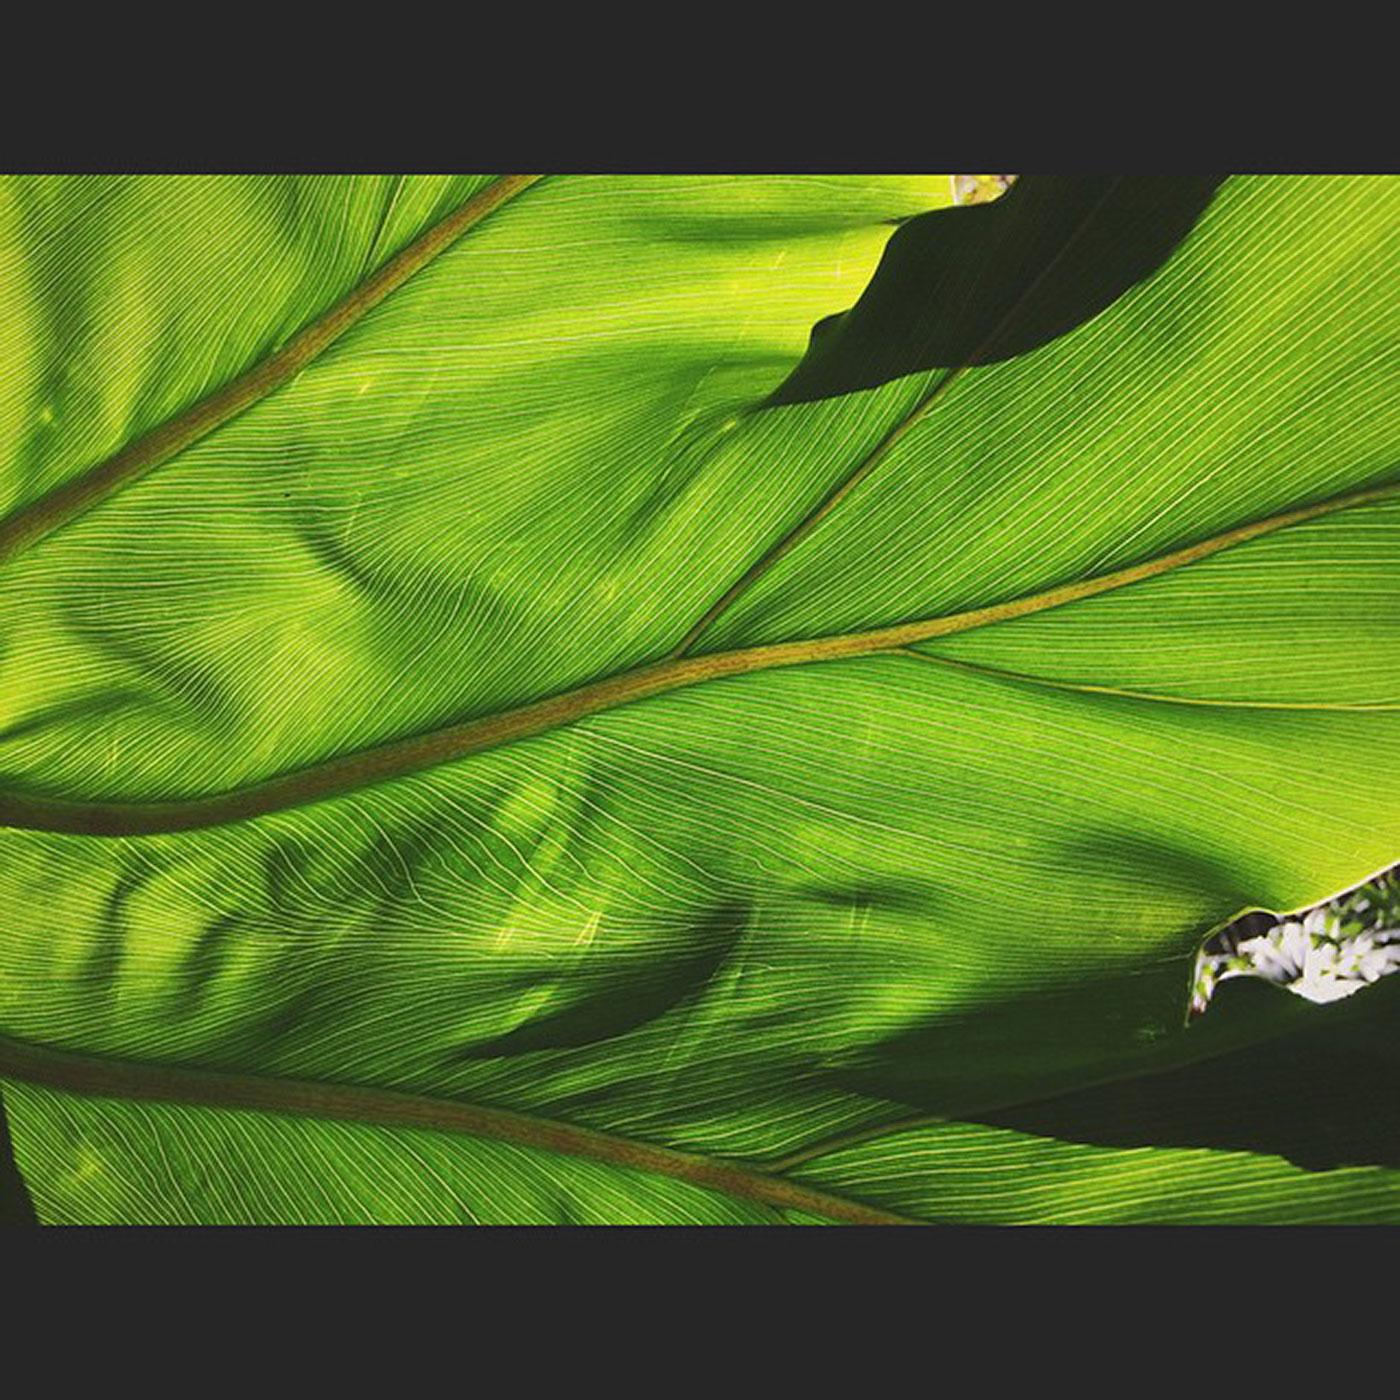 the-tropics-palms-veins-life-131365_17614575920_o.jpg